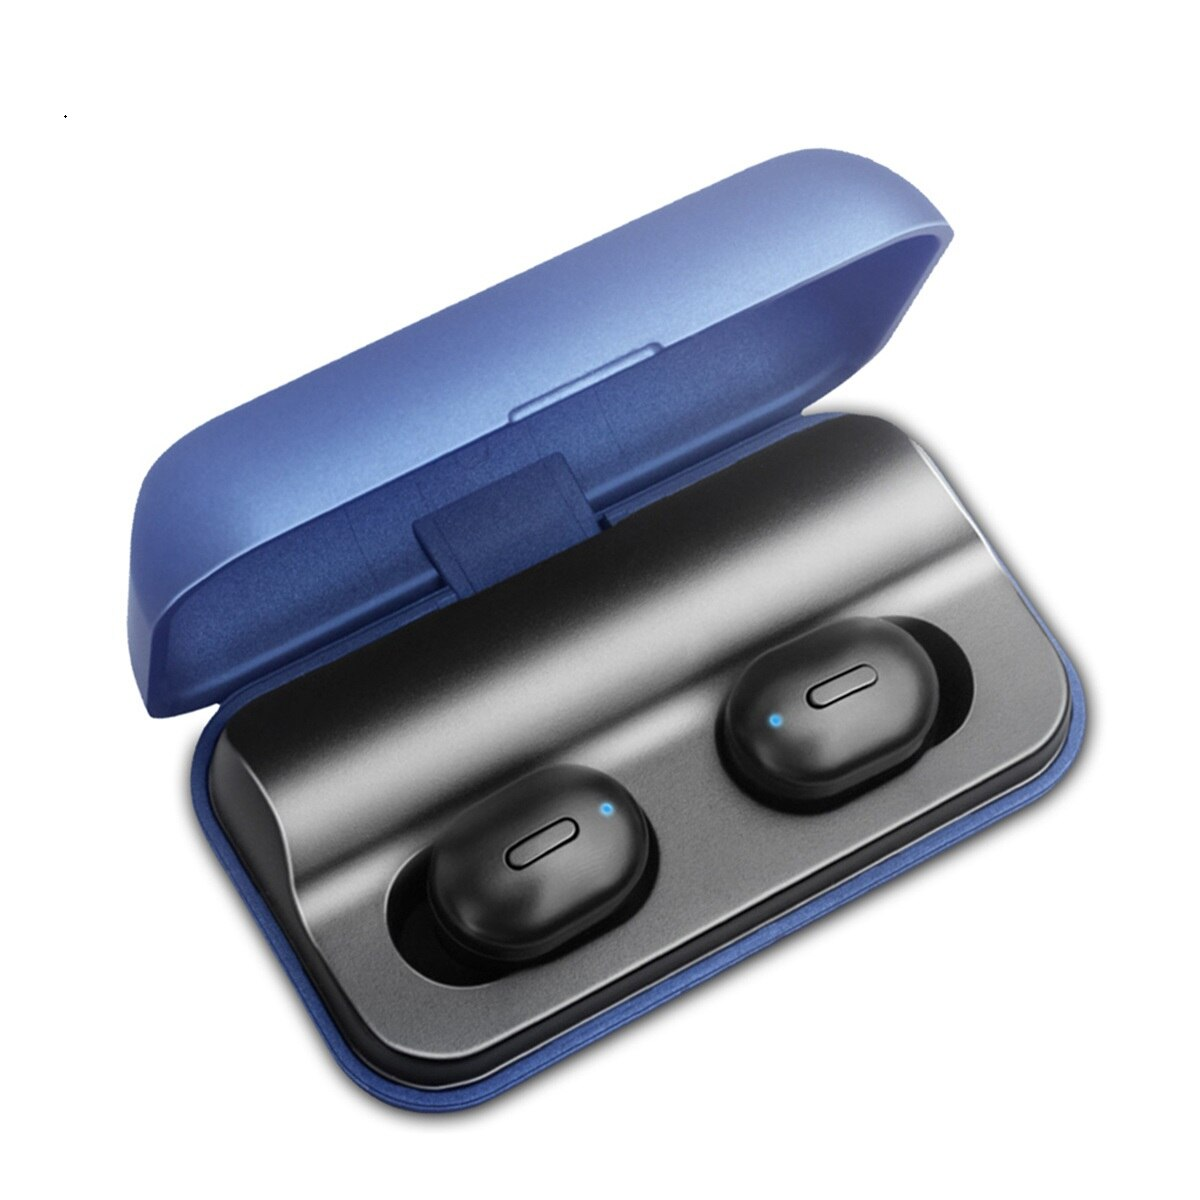 TWS 3D Estéreo Fones de Ouvido Sem Fio bluetooth 5.0 Fones De Ouvido Esporte Handsfree Fones De Ouvido Com Microfone Caixa de Carga À Prova D Água